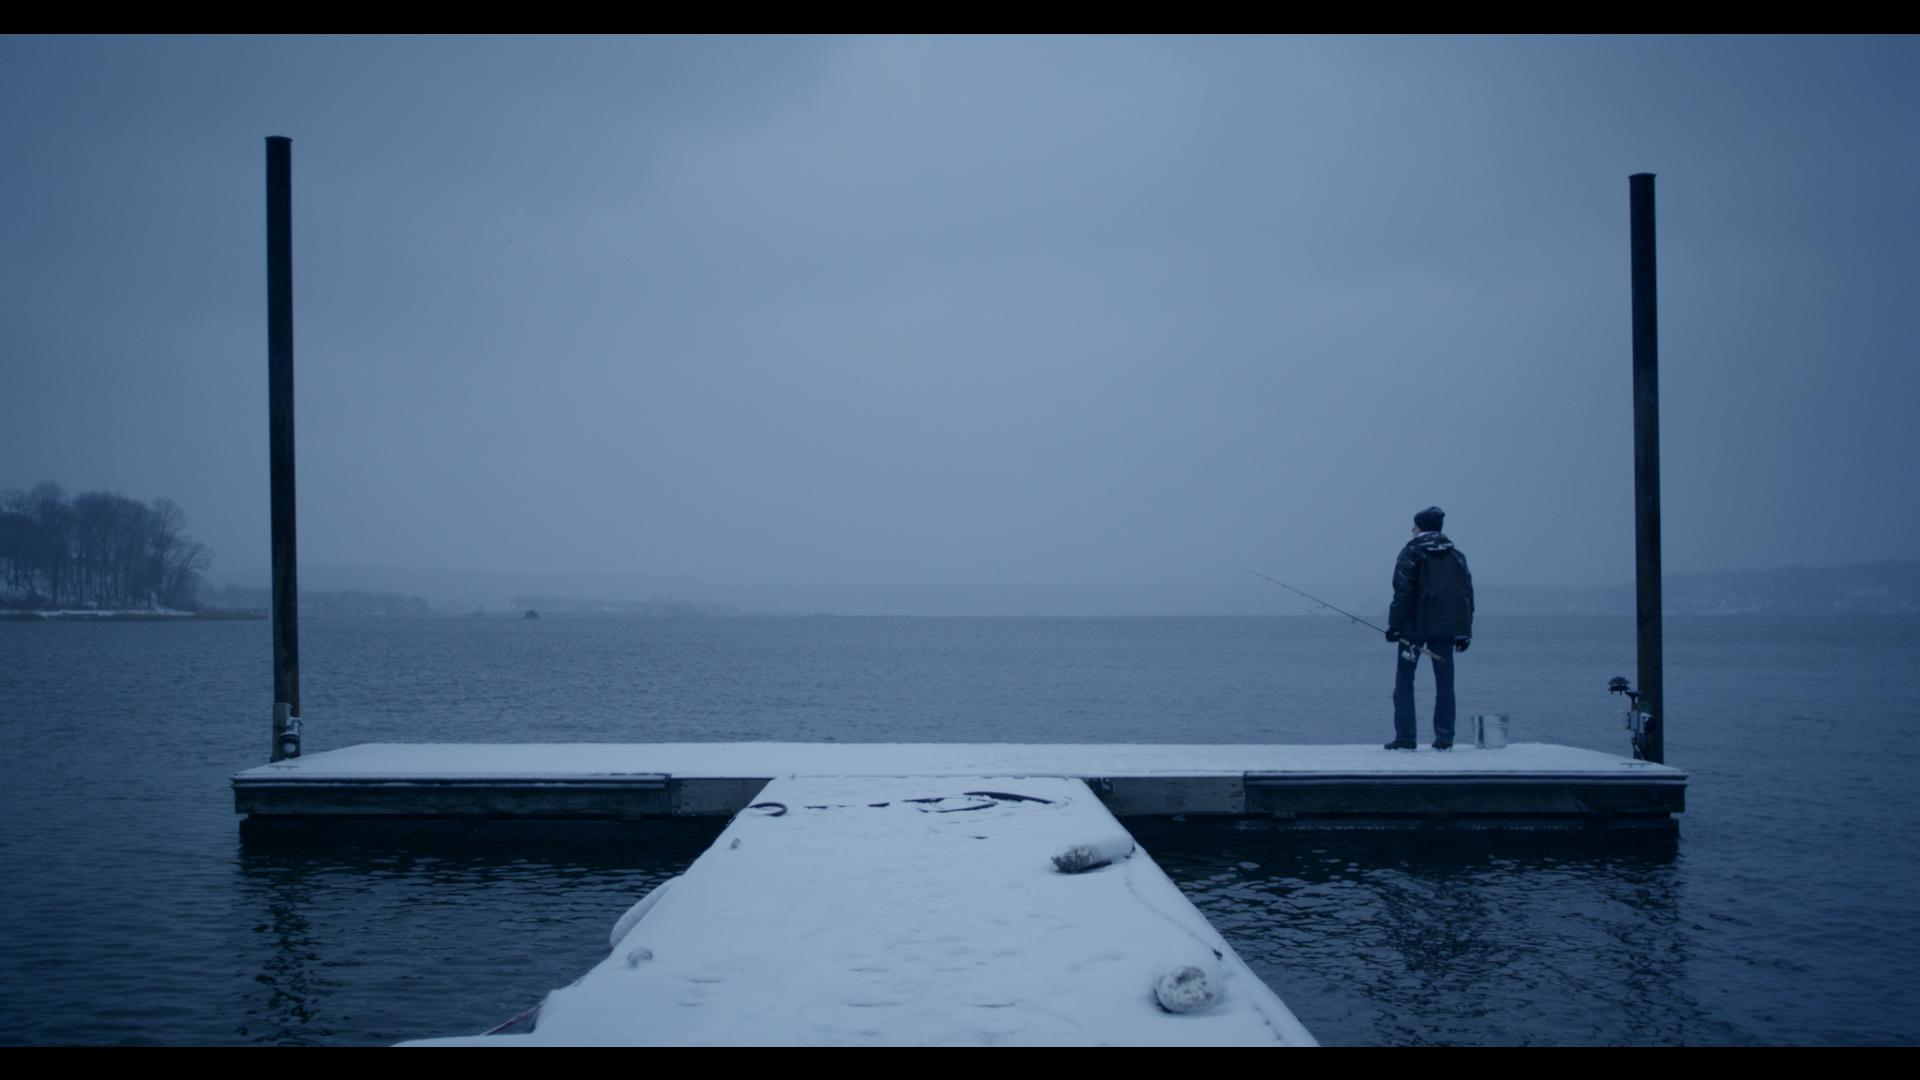 Fisherman_1.jpg